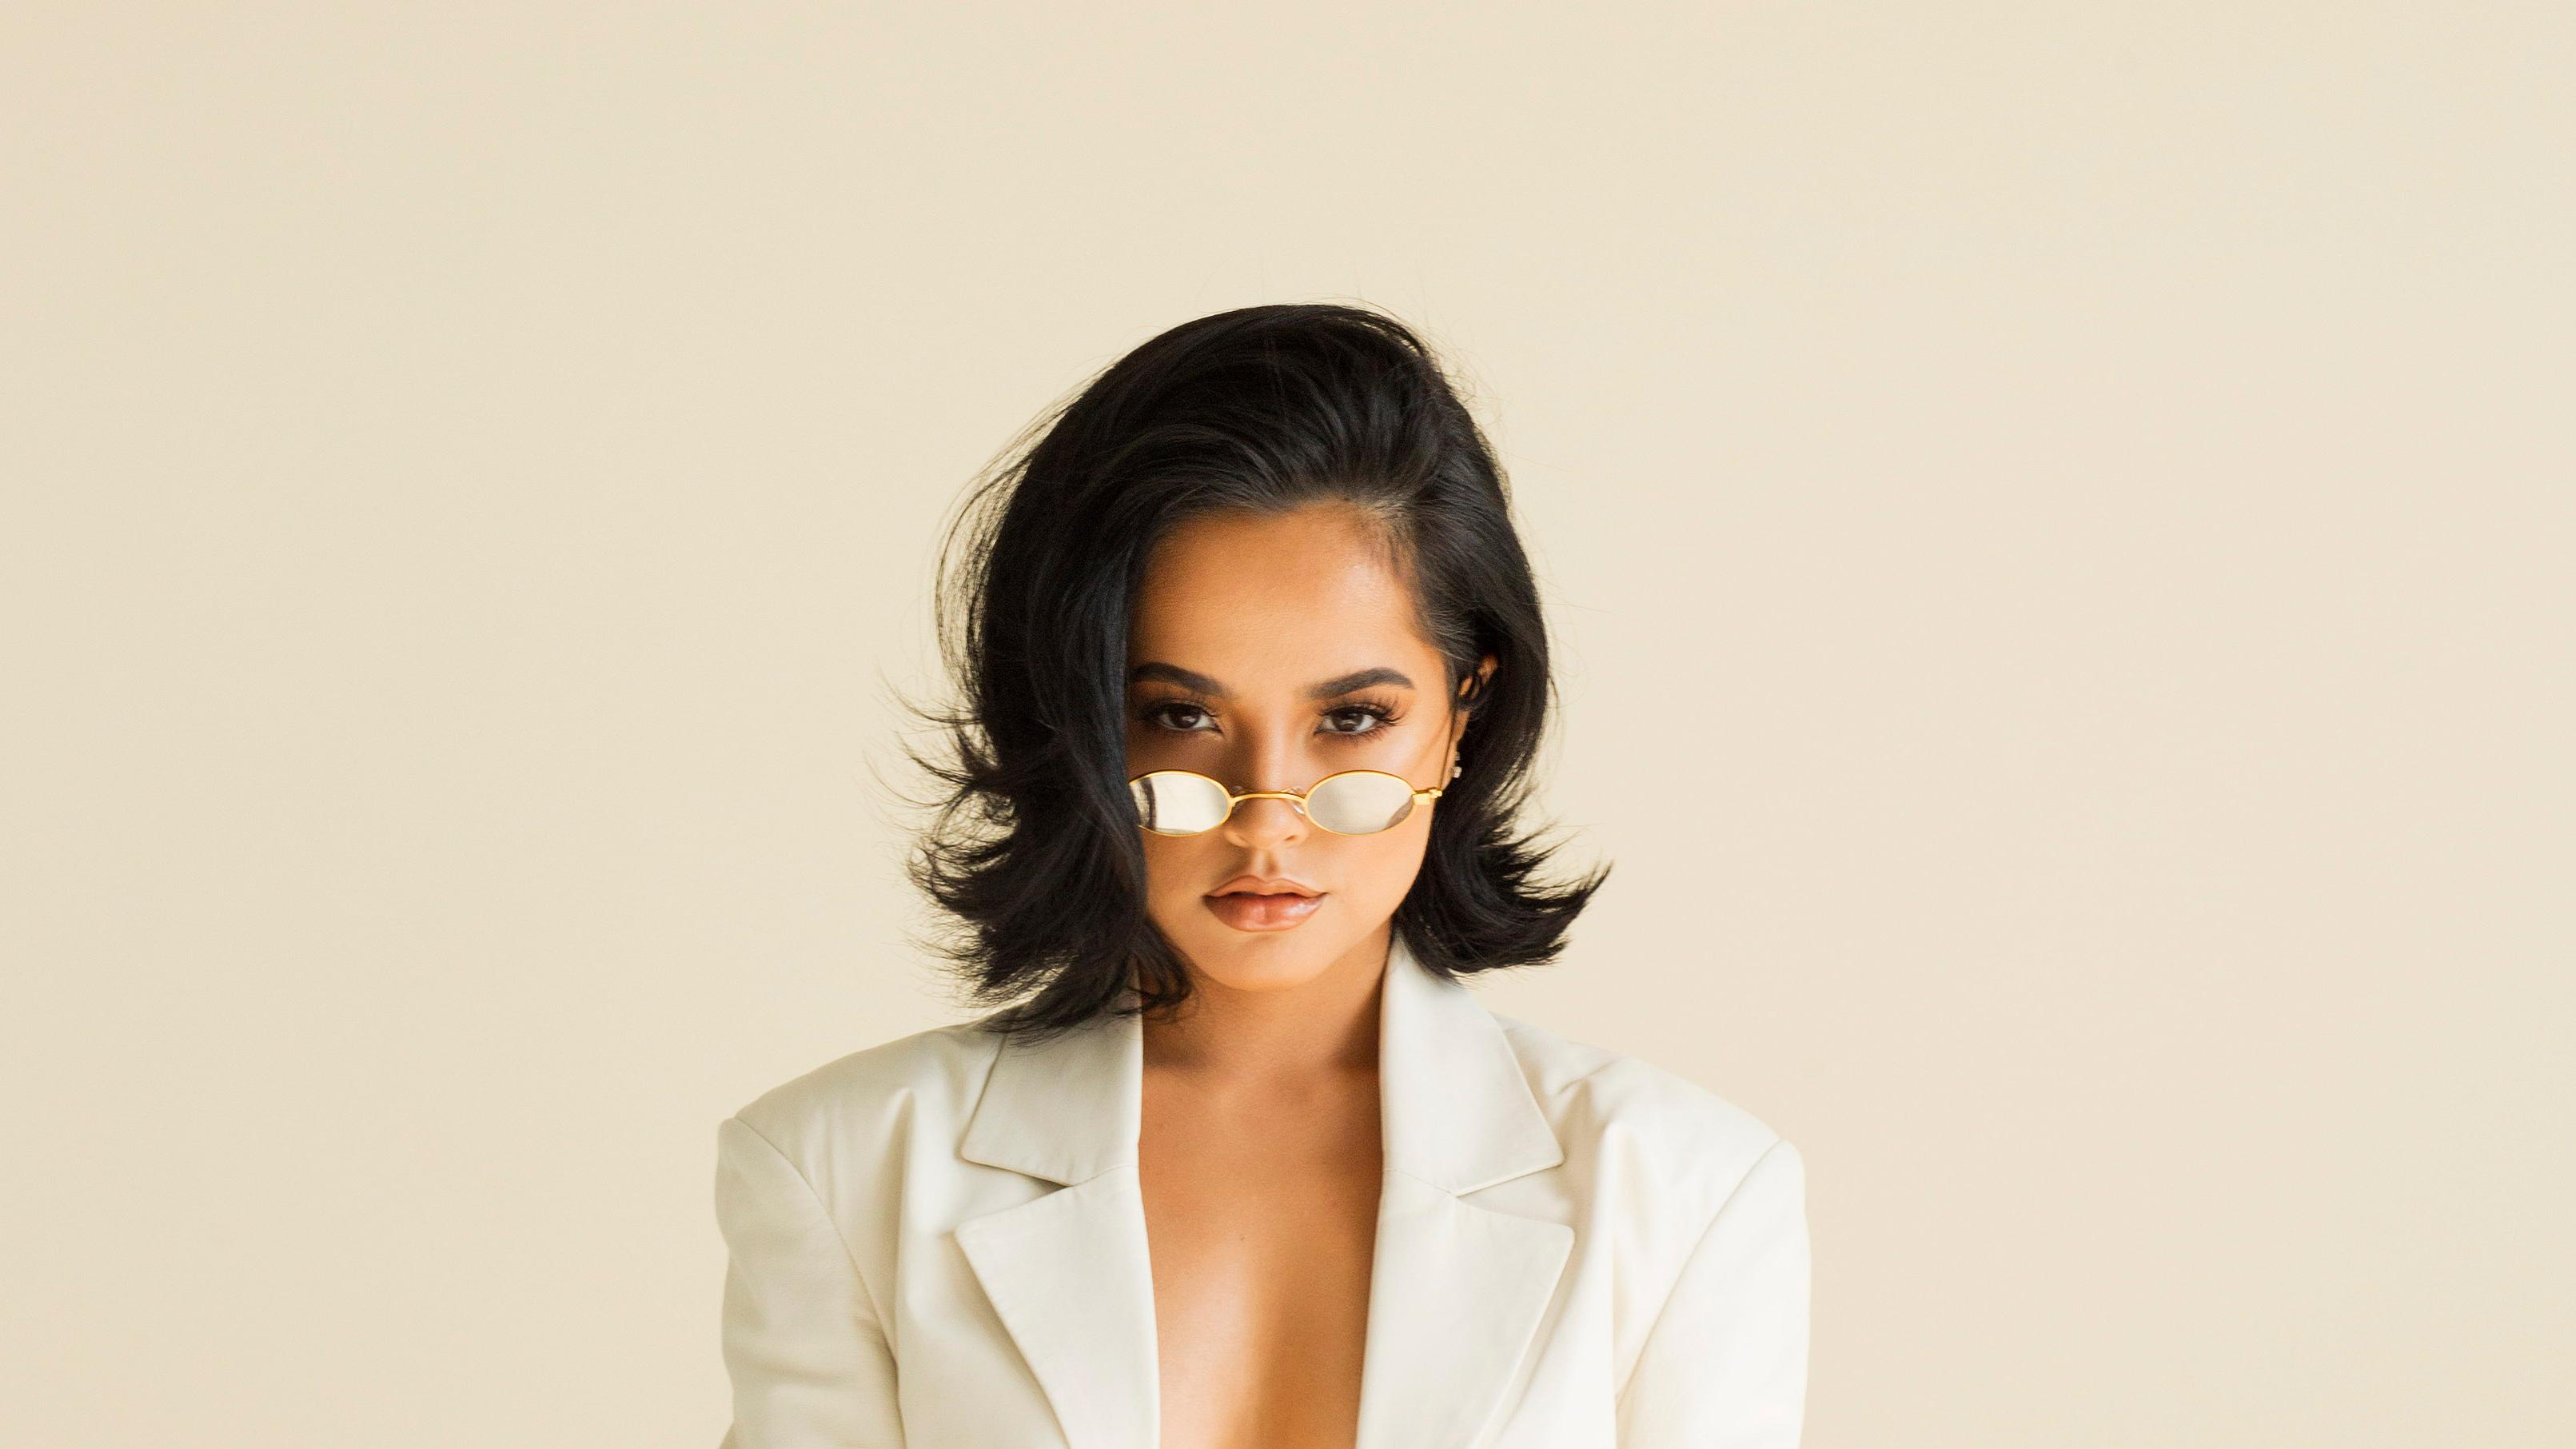 American Becky G Black Hair Brown Eyes Singer Sunglasses 3222x1812